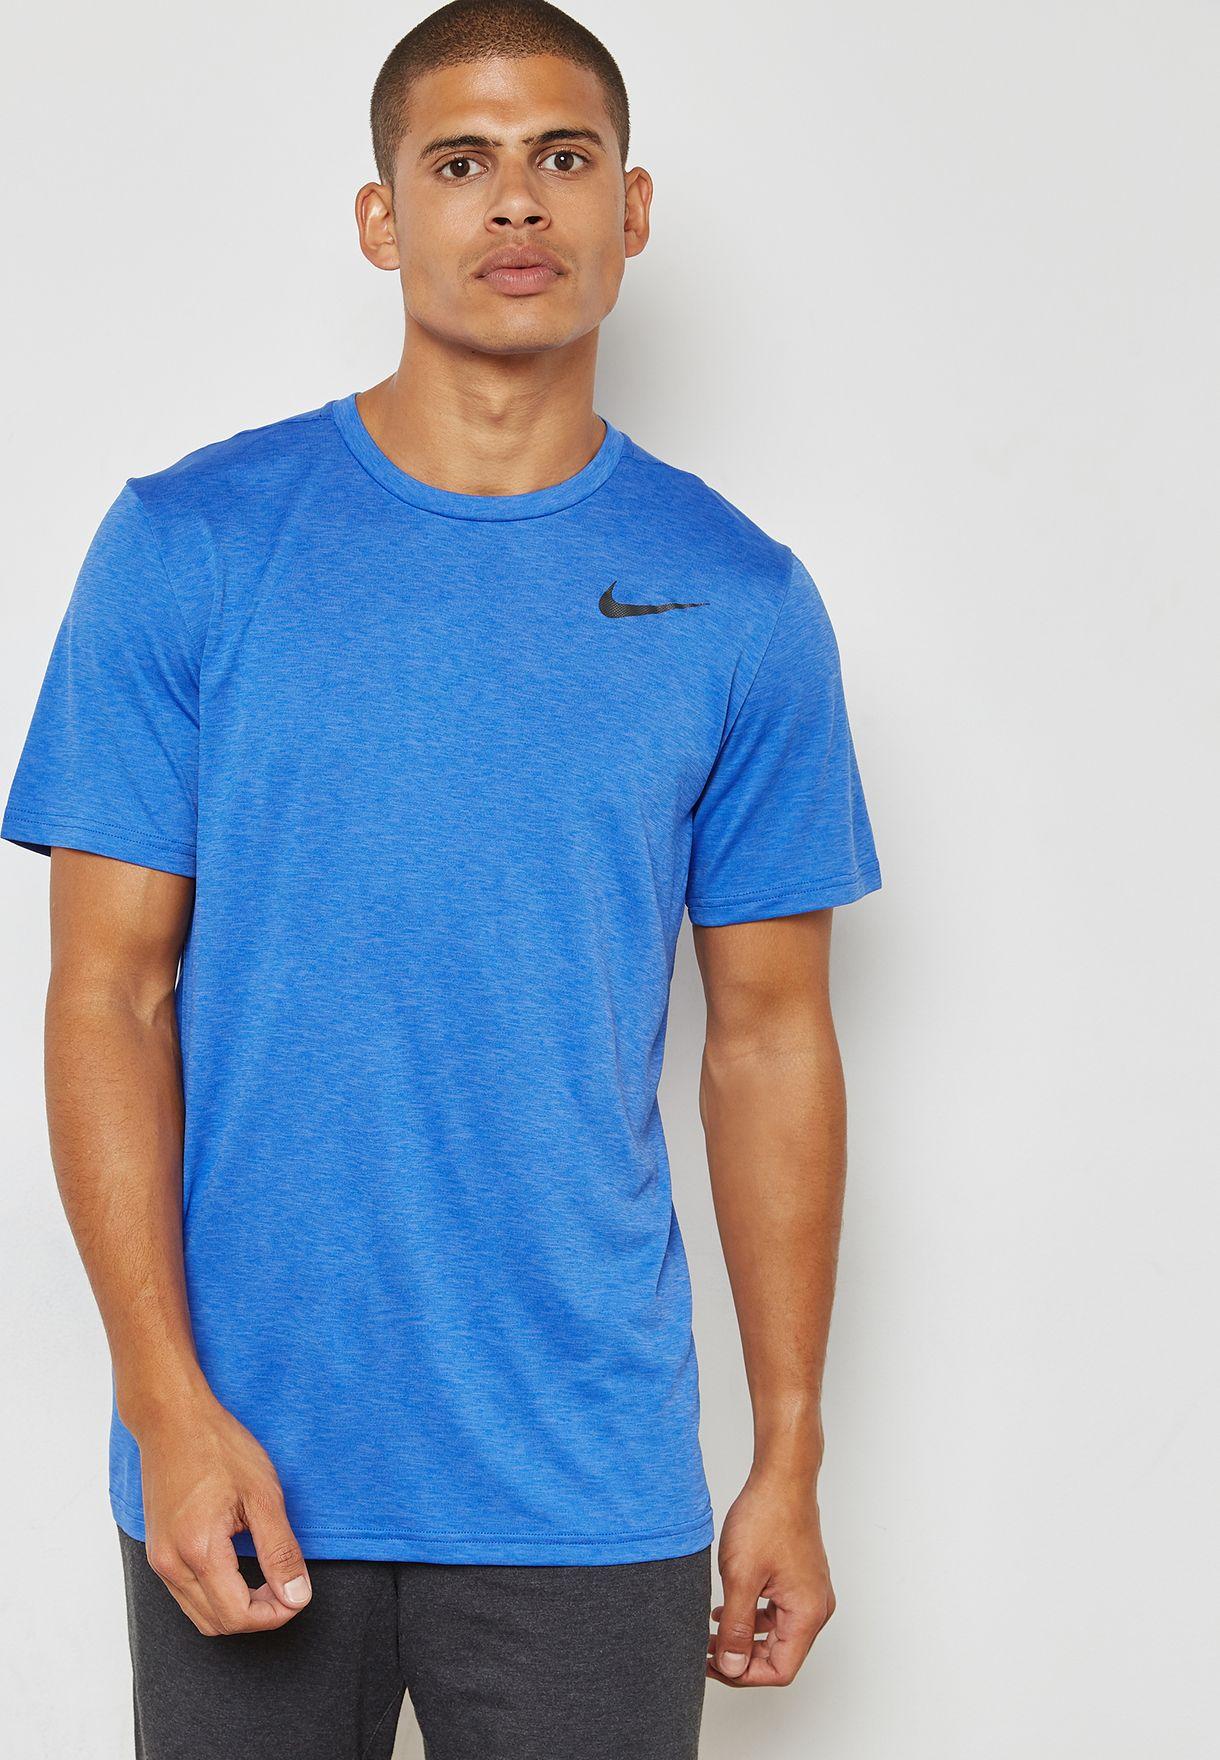 c0b44386 Shop Nike blue Dri-FIT Breathe T-Shirt 832835-461 for Men in ...